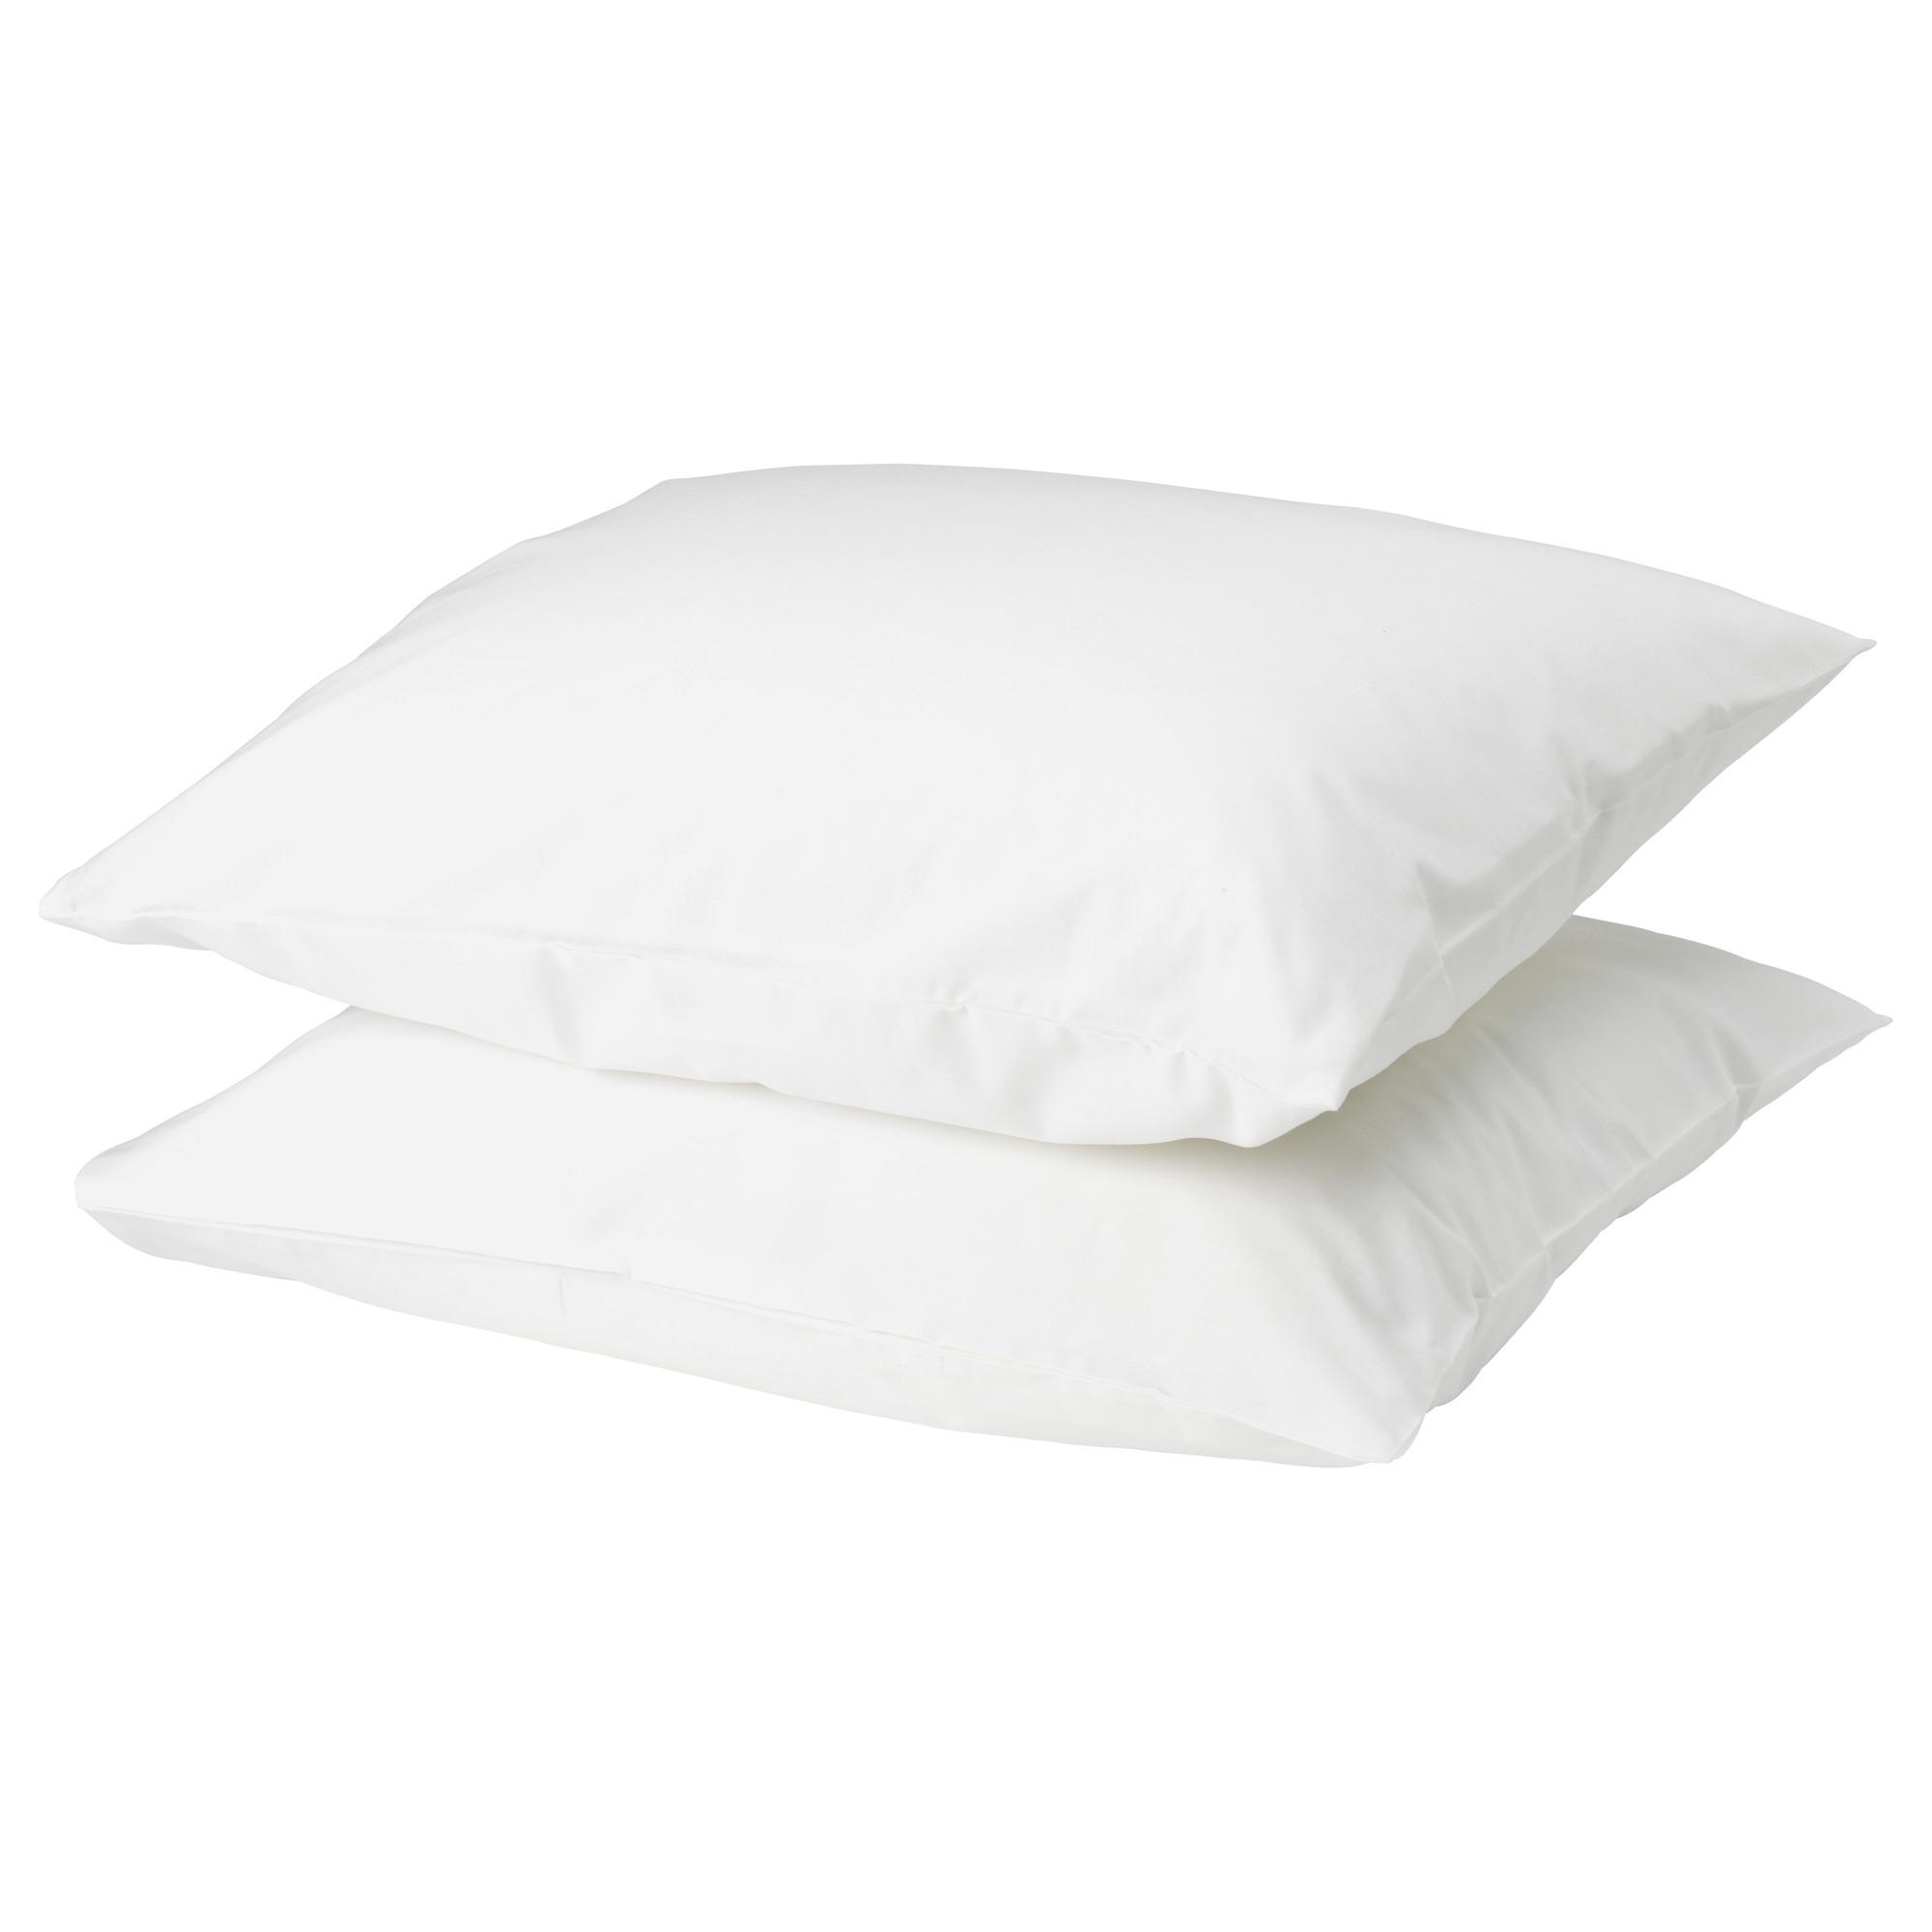 dvala 50x60 funda para almohada blanco. Black Bedroom Furniture Sets. Home Design Ideas